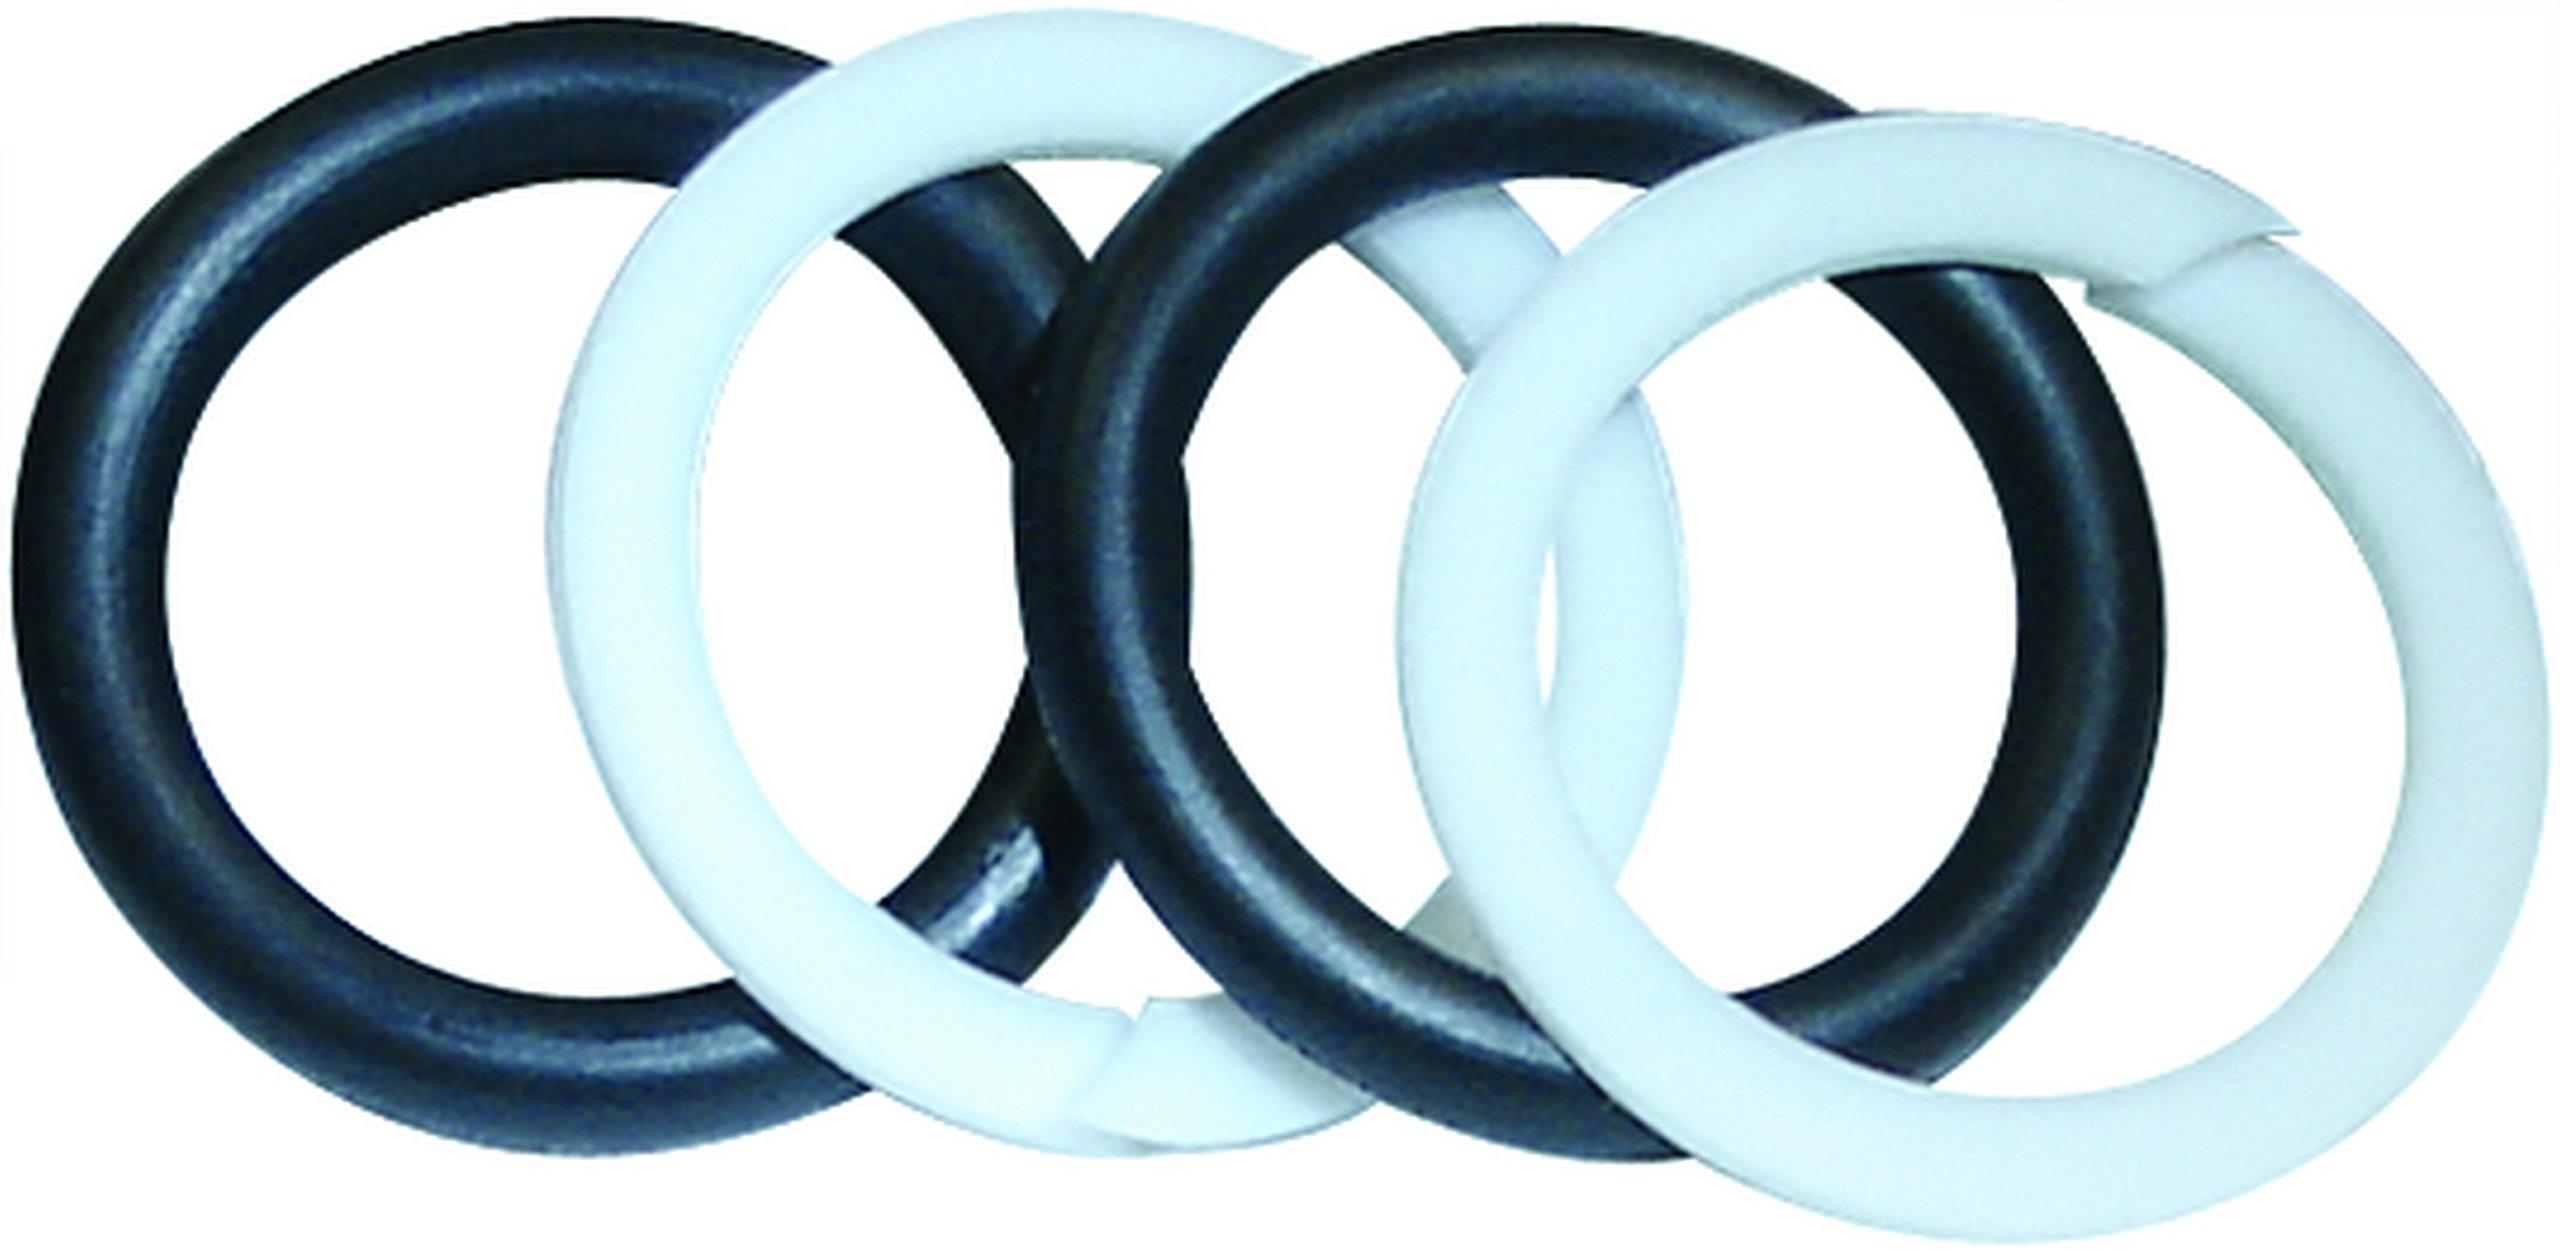 Coxreels 1935-1-SEALKIT Viton Replacement Swivel O-Ring Seal Kit, 3/8'' Size